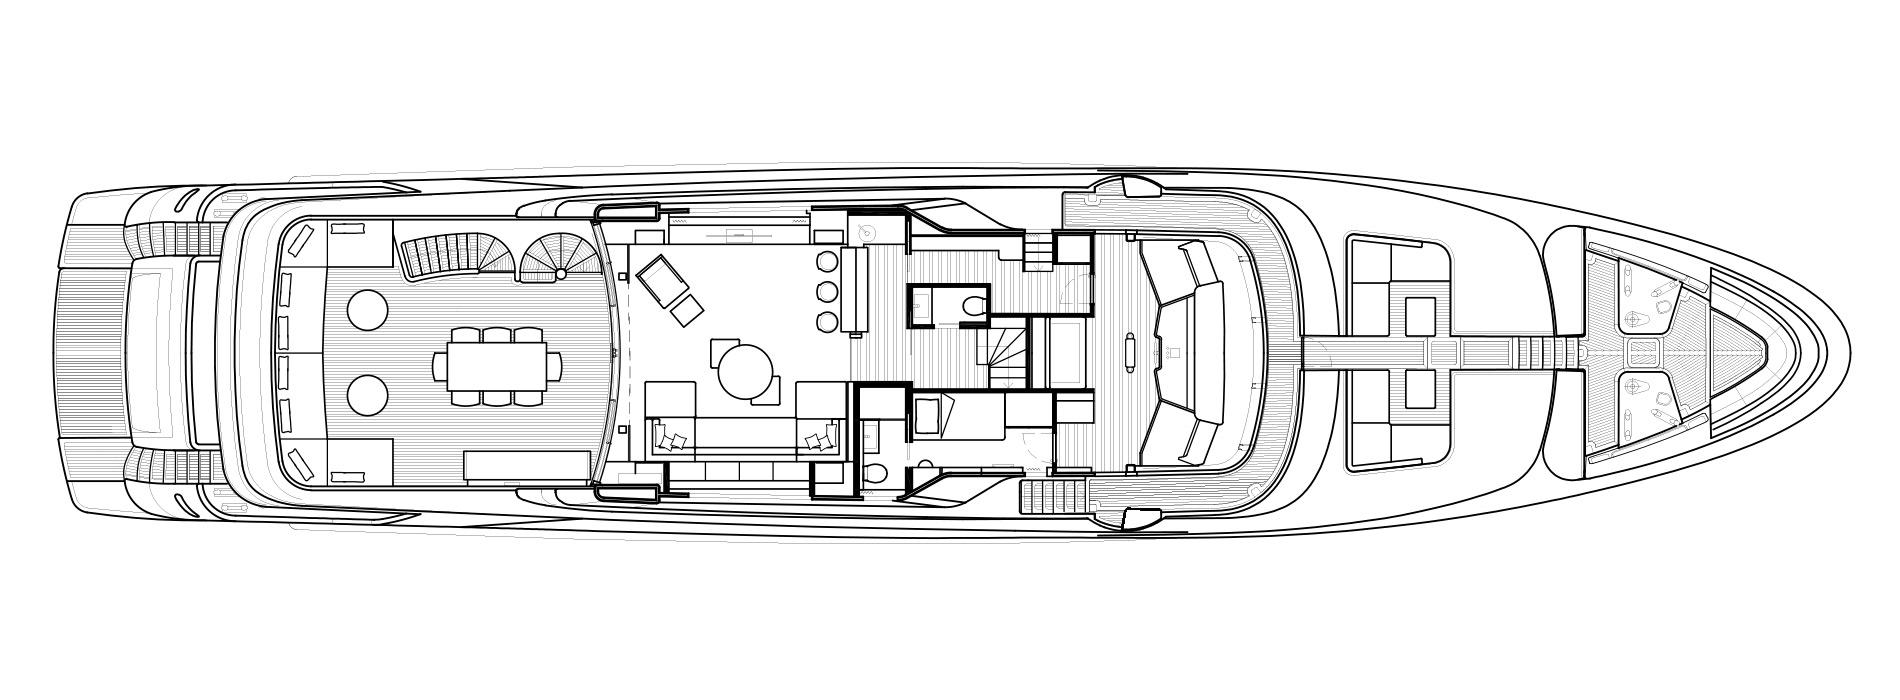 Sanlorenzo Yachts SD126 верхний палуба версия A